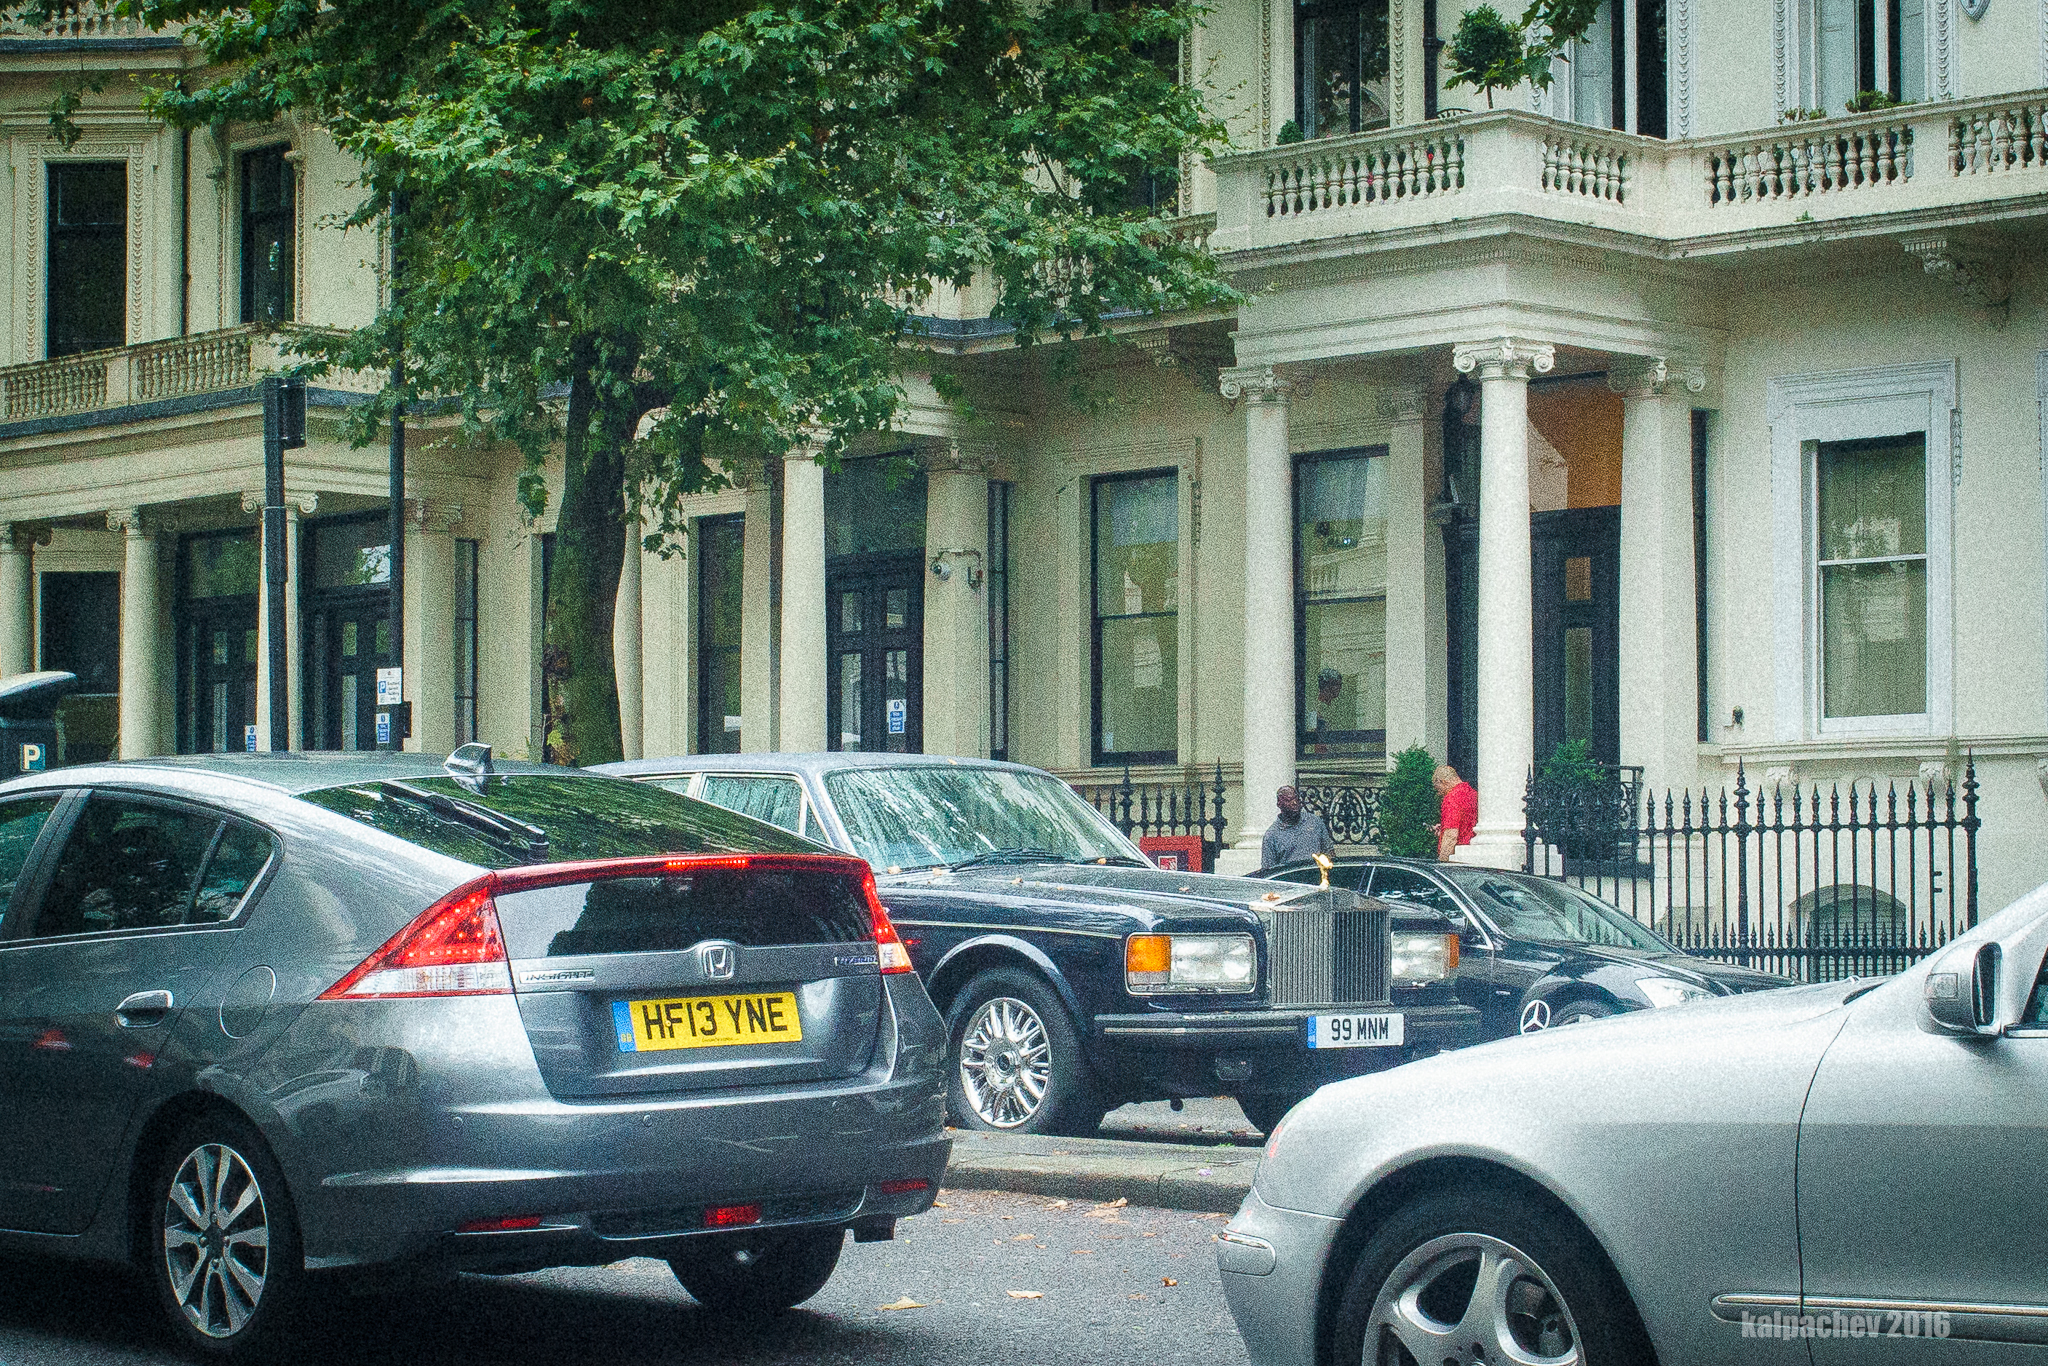 Kensington, Central London